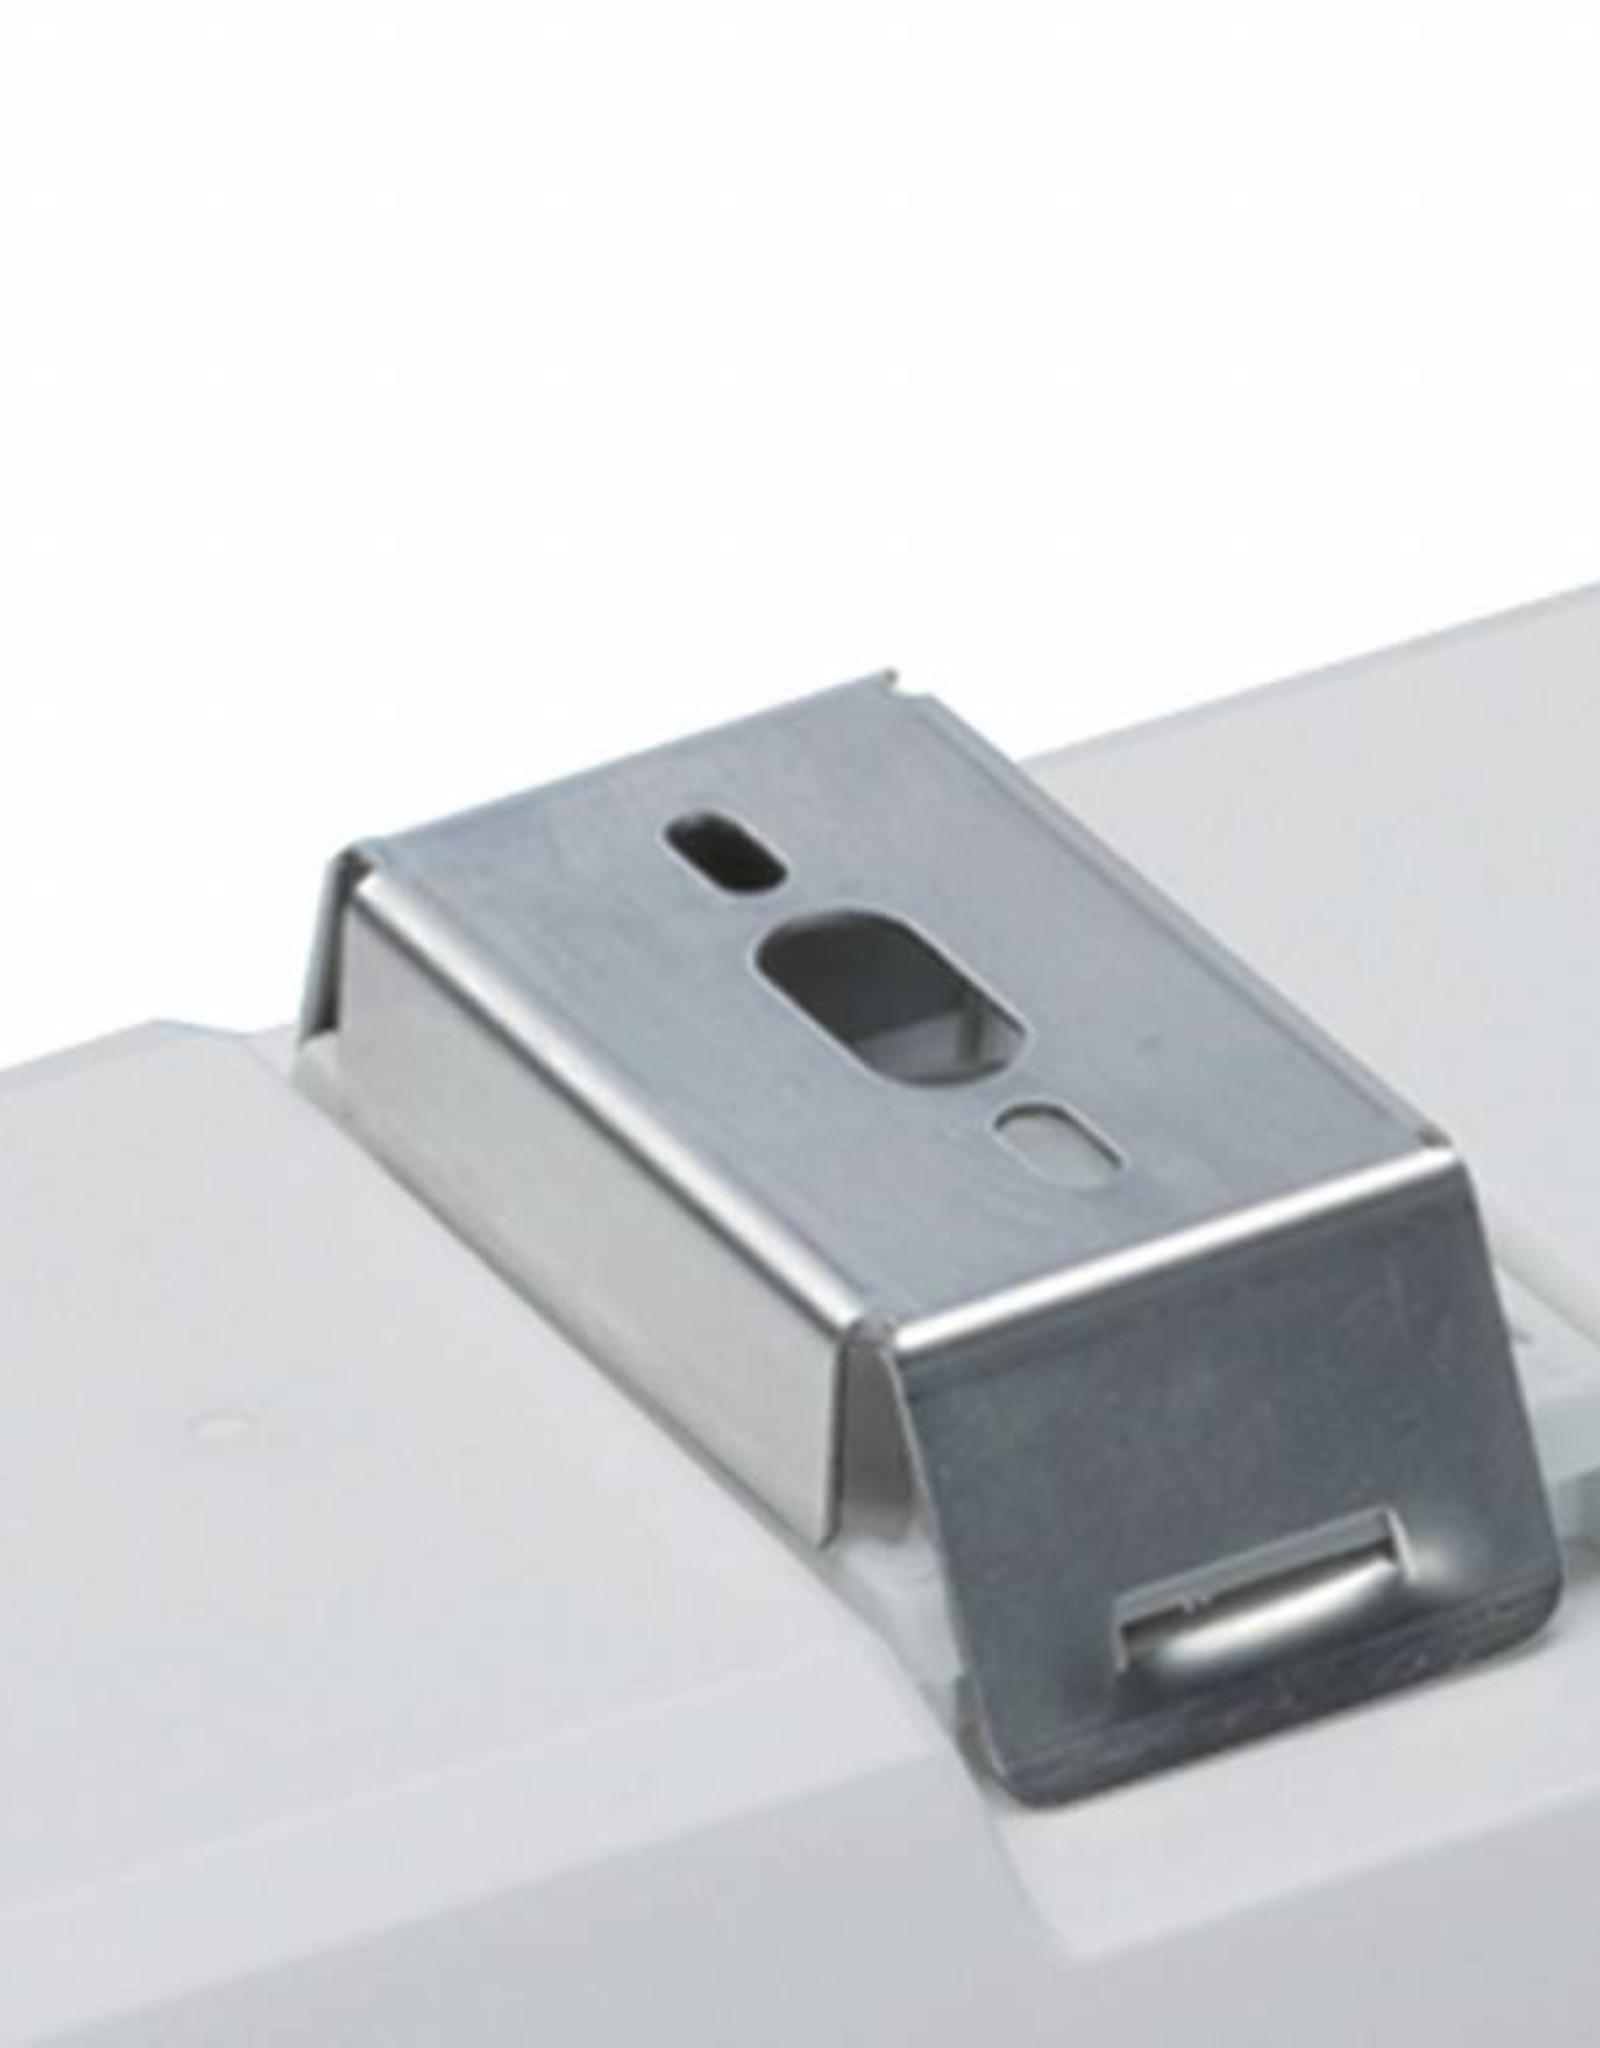 PRIMA FUTURA 2.5ft ABSc Al 8000/840 met DALI dimmer